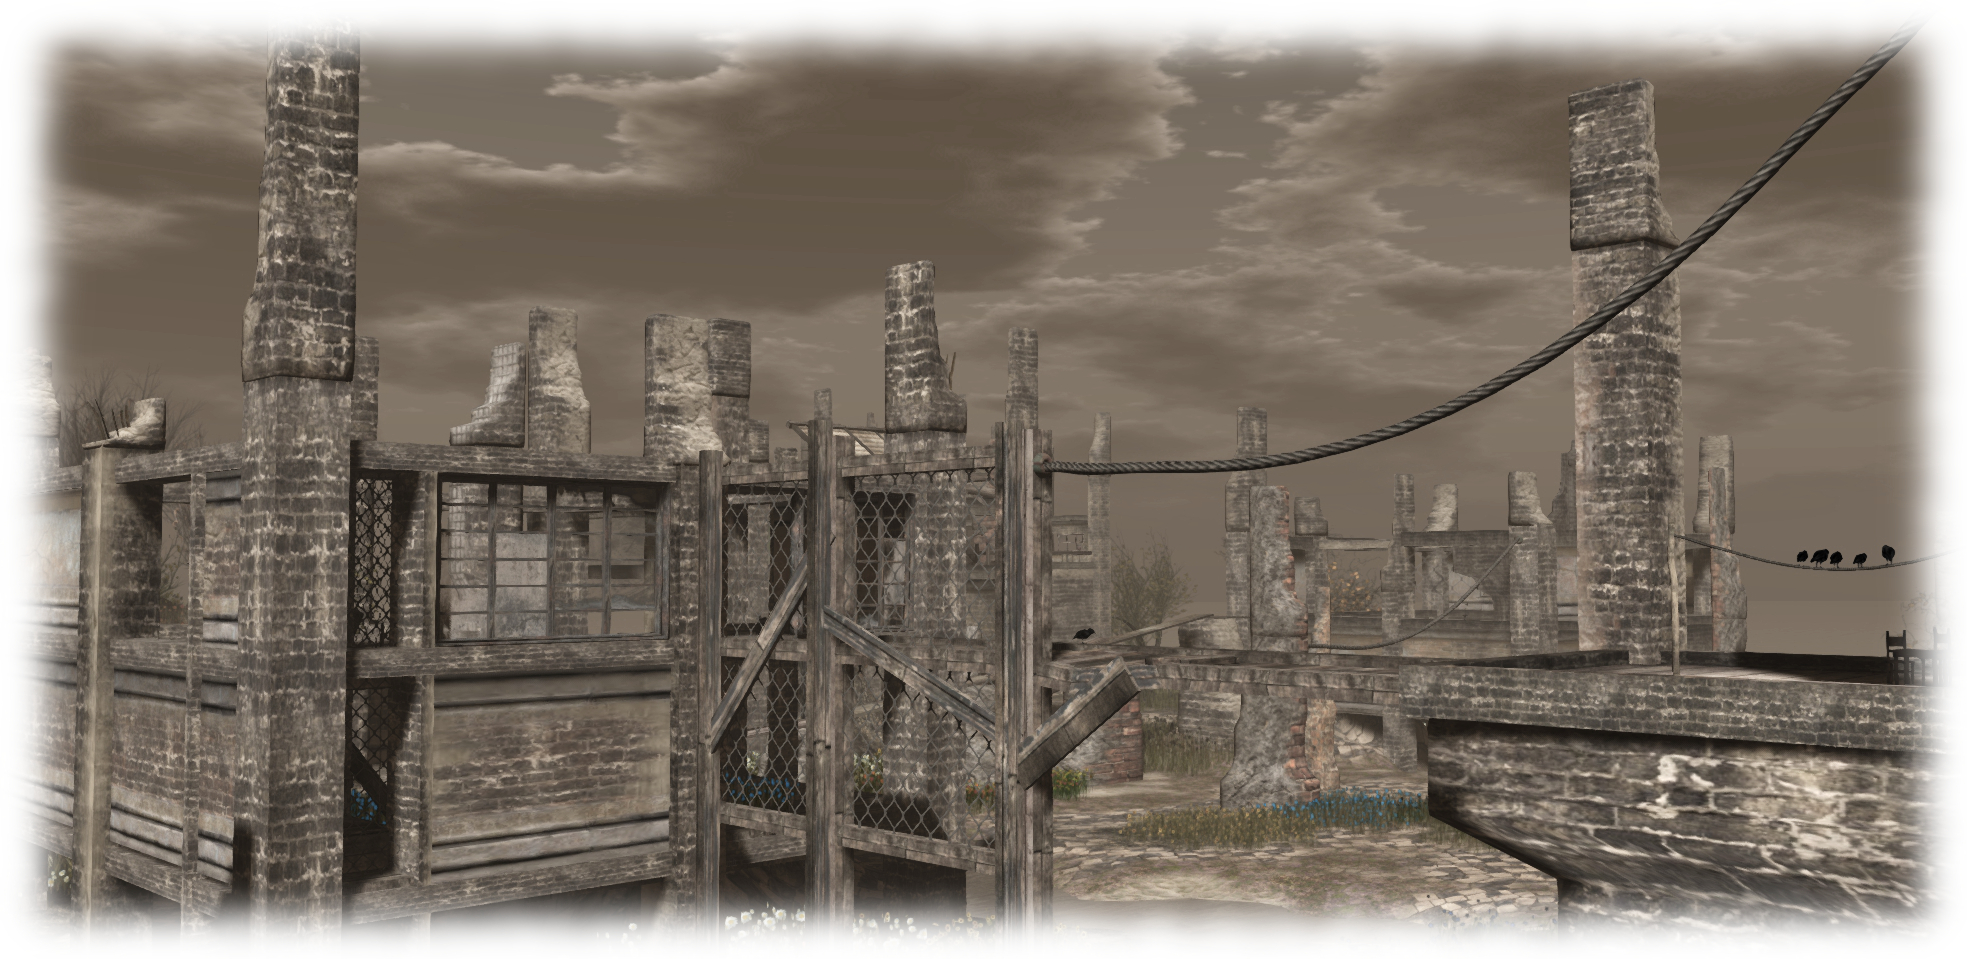 Ruins, Wondering Dew; Inara Pey, March 2015, on Flickr